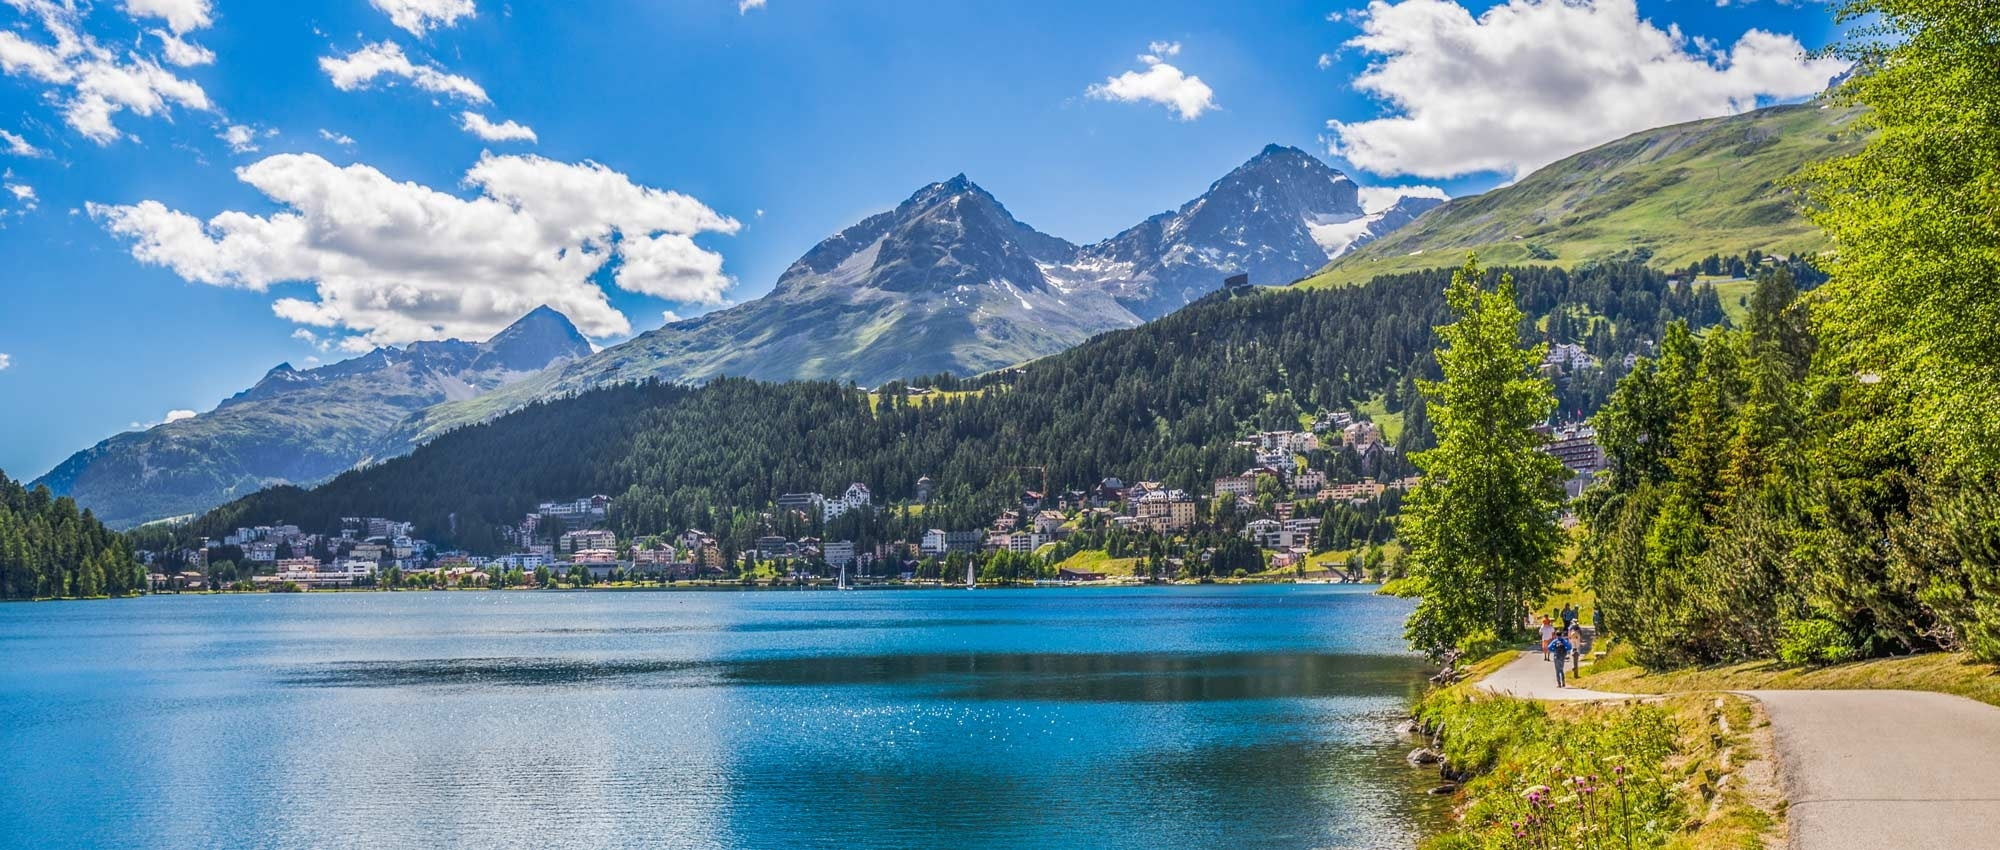 Noleggio Mini a St Moritz